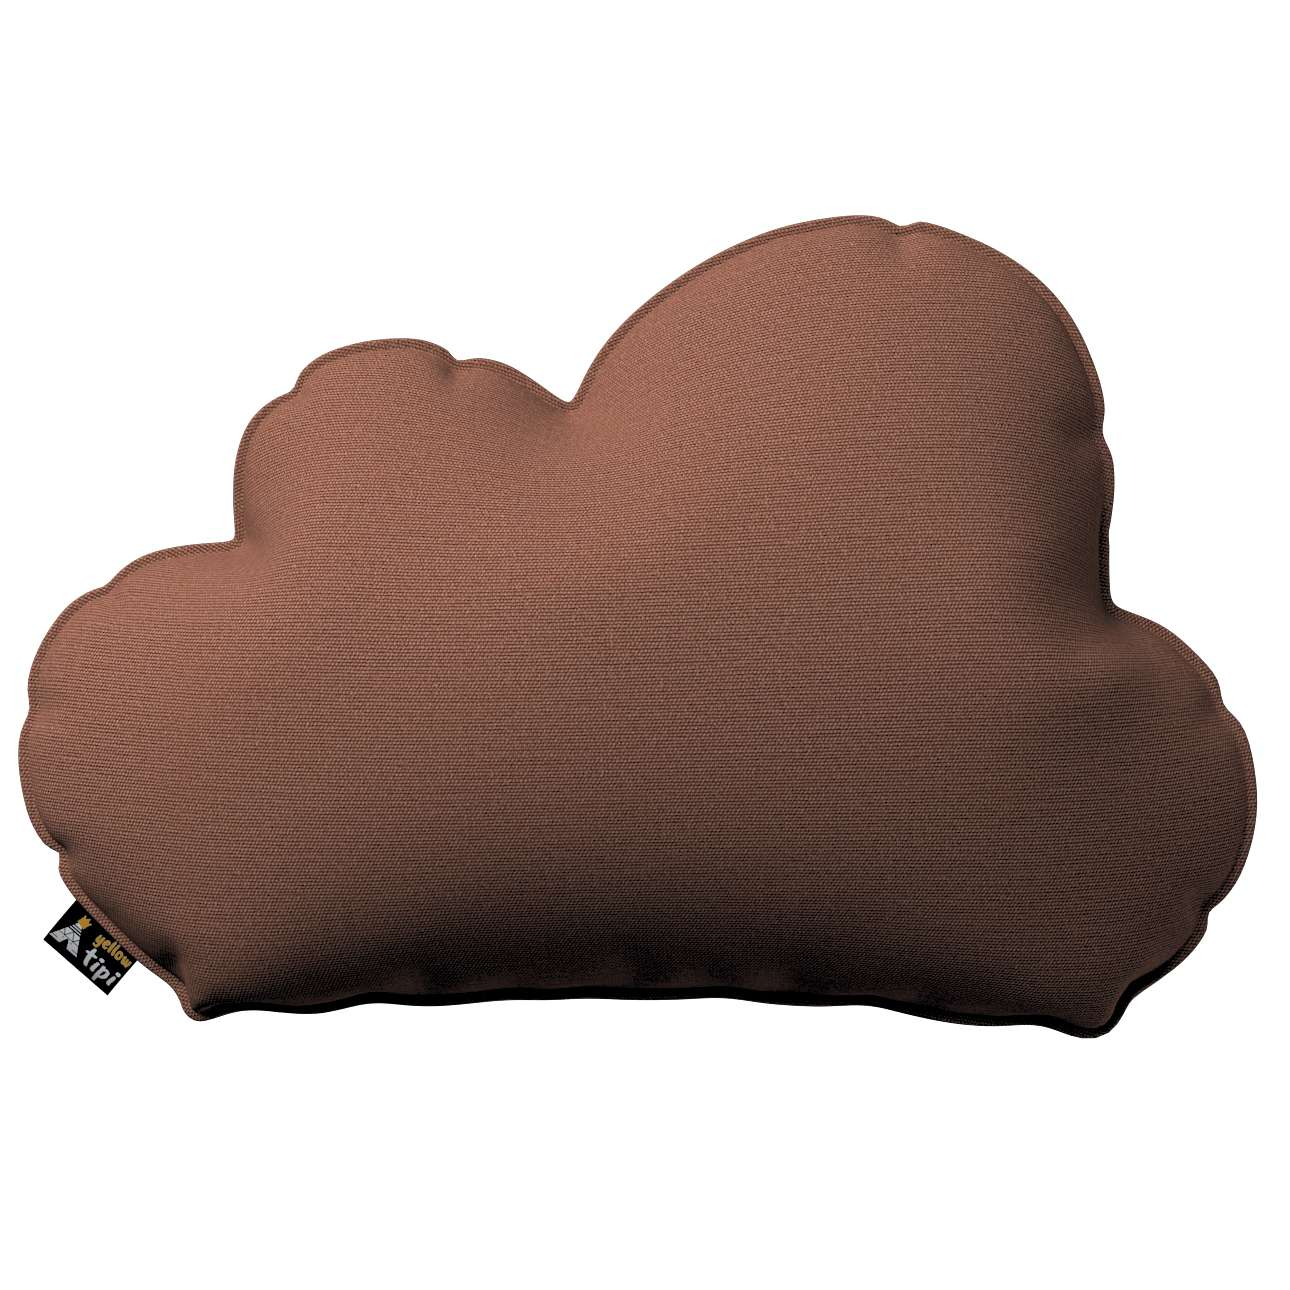 Soft Cloud pagalvėlė kolekcijoje Happiness, audinys: 133-09